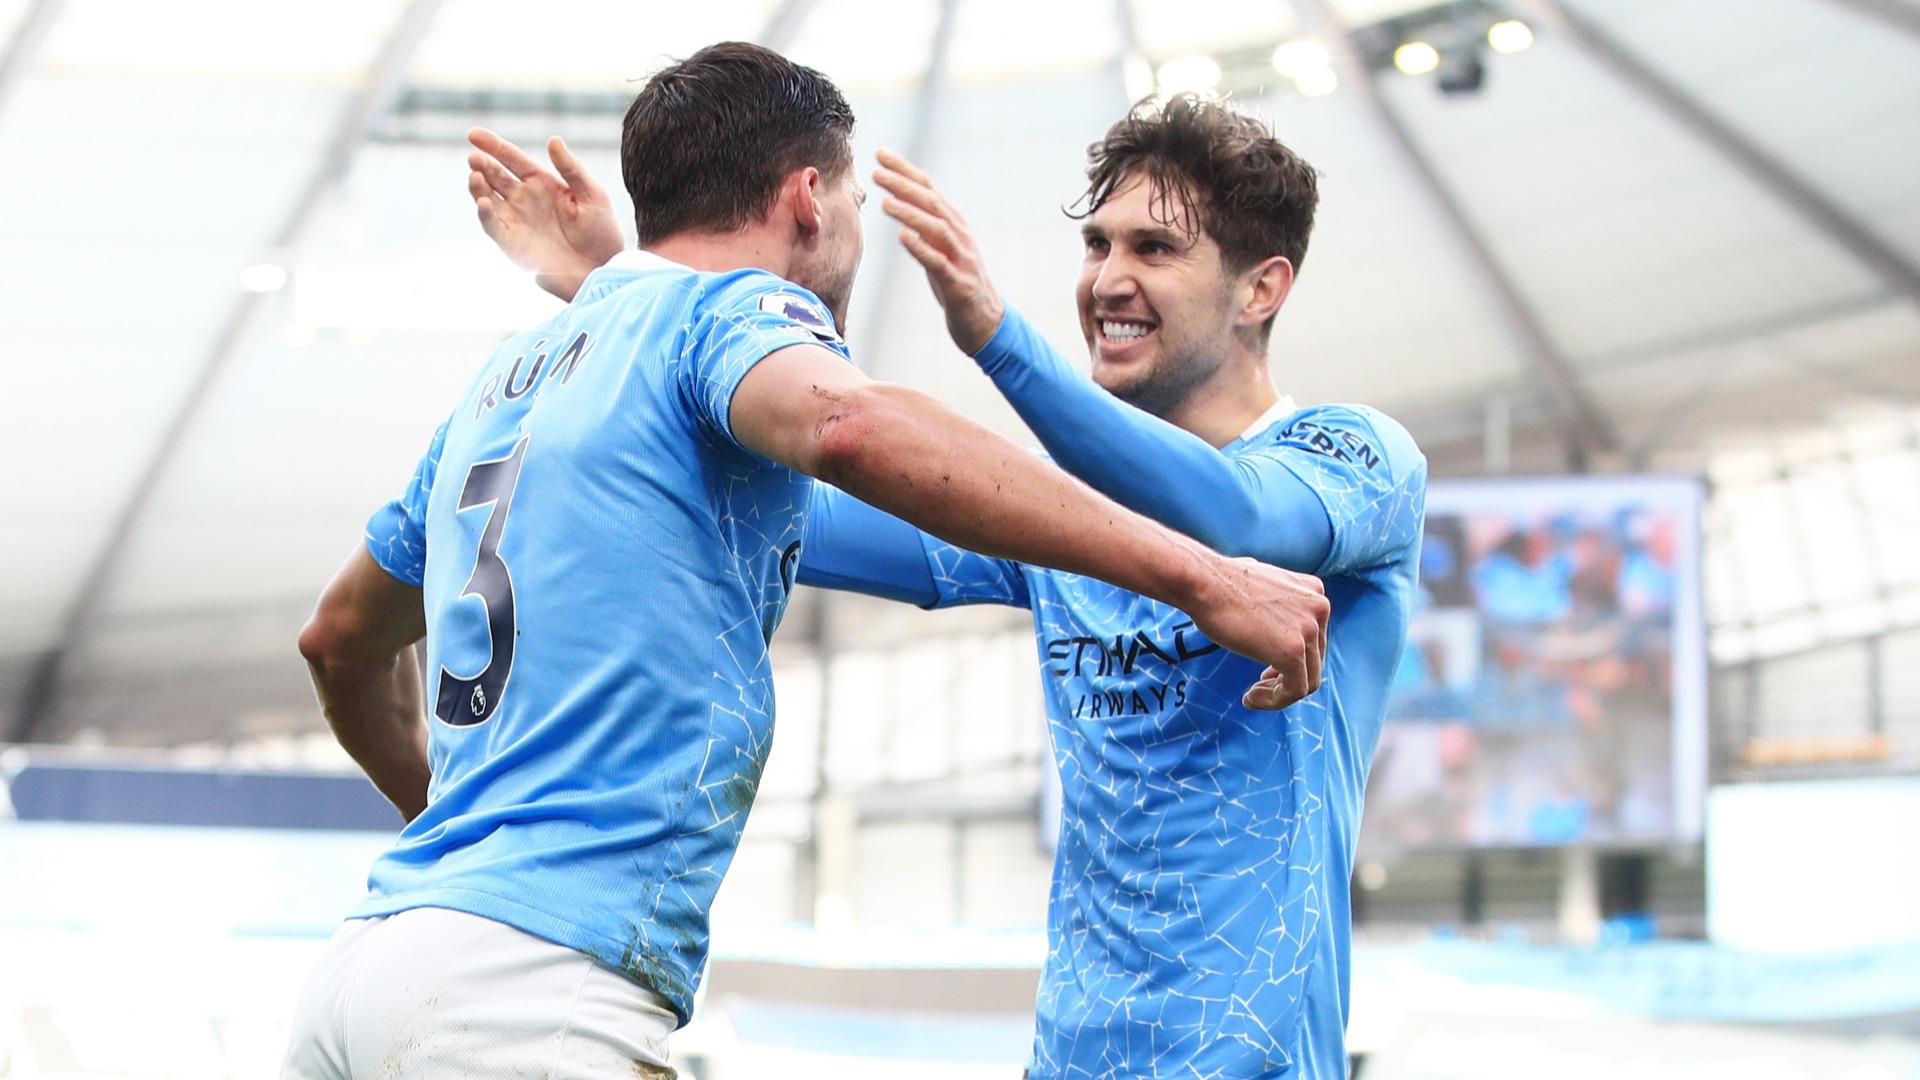 Man City win Premier League 2020-21: Dias, Gundogan, De Bruyne and the key men in Guardiola's latest success